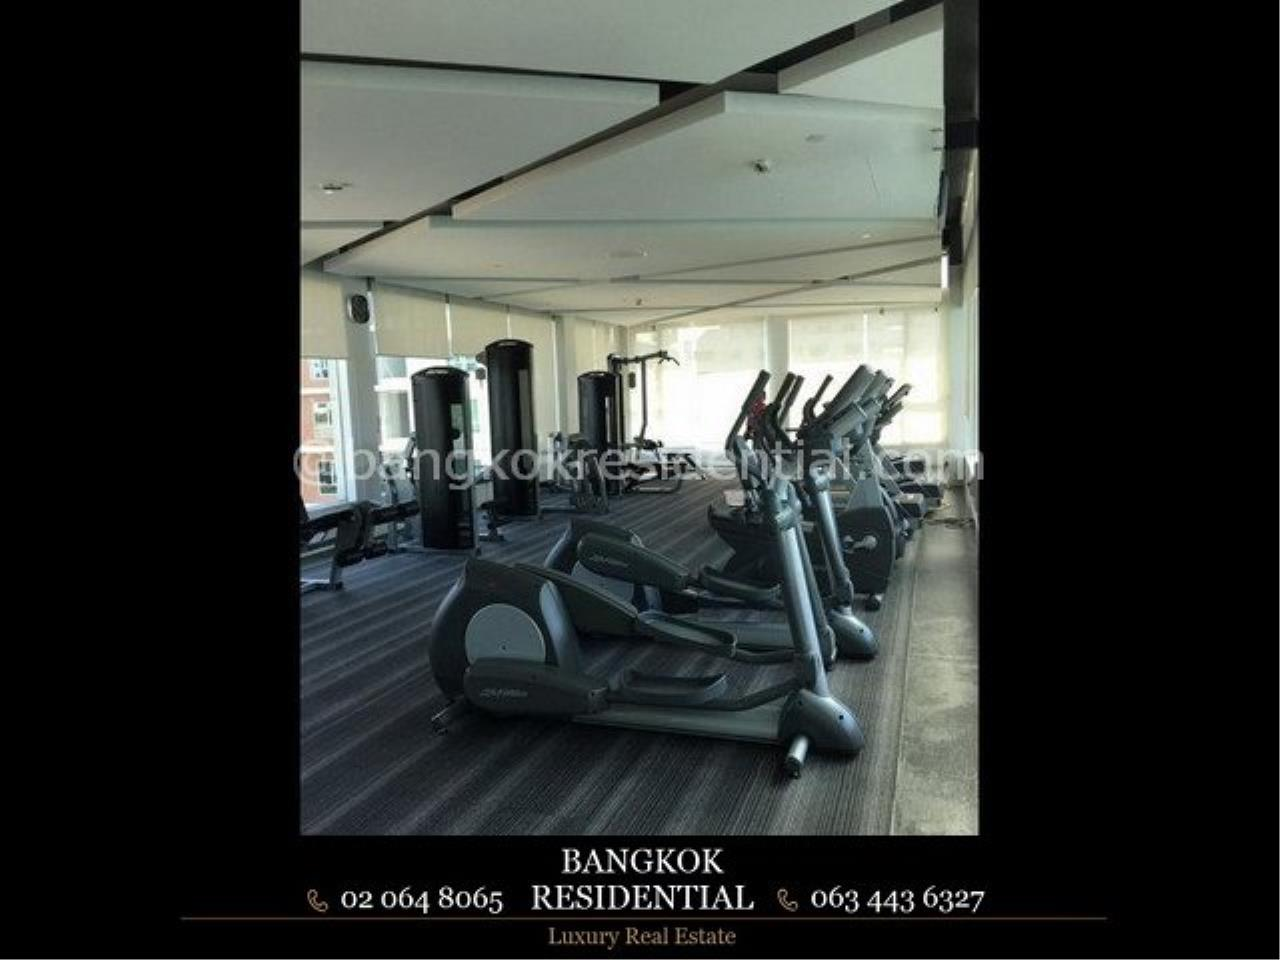 Bangkok Residential Agency's 1BR Siri at Sukhumvit For Rent (BR4782CD) 5